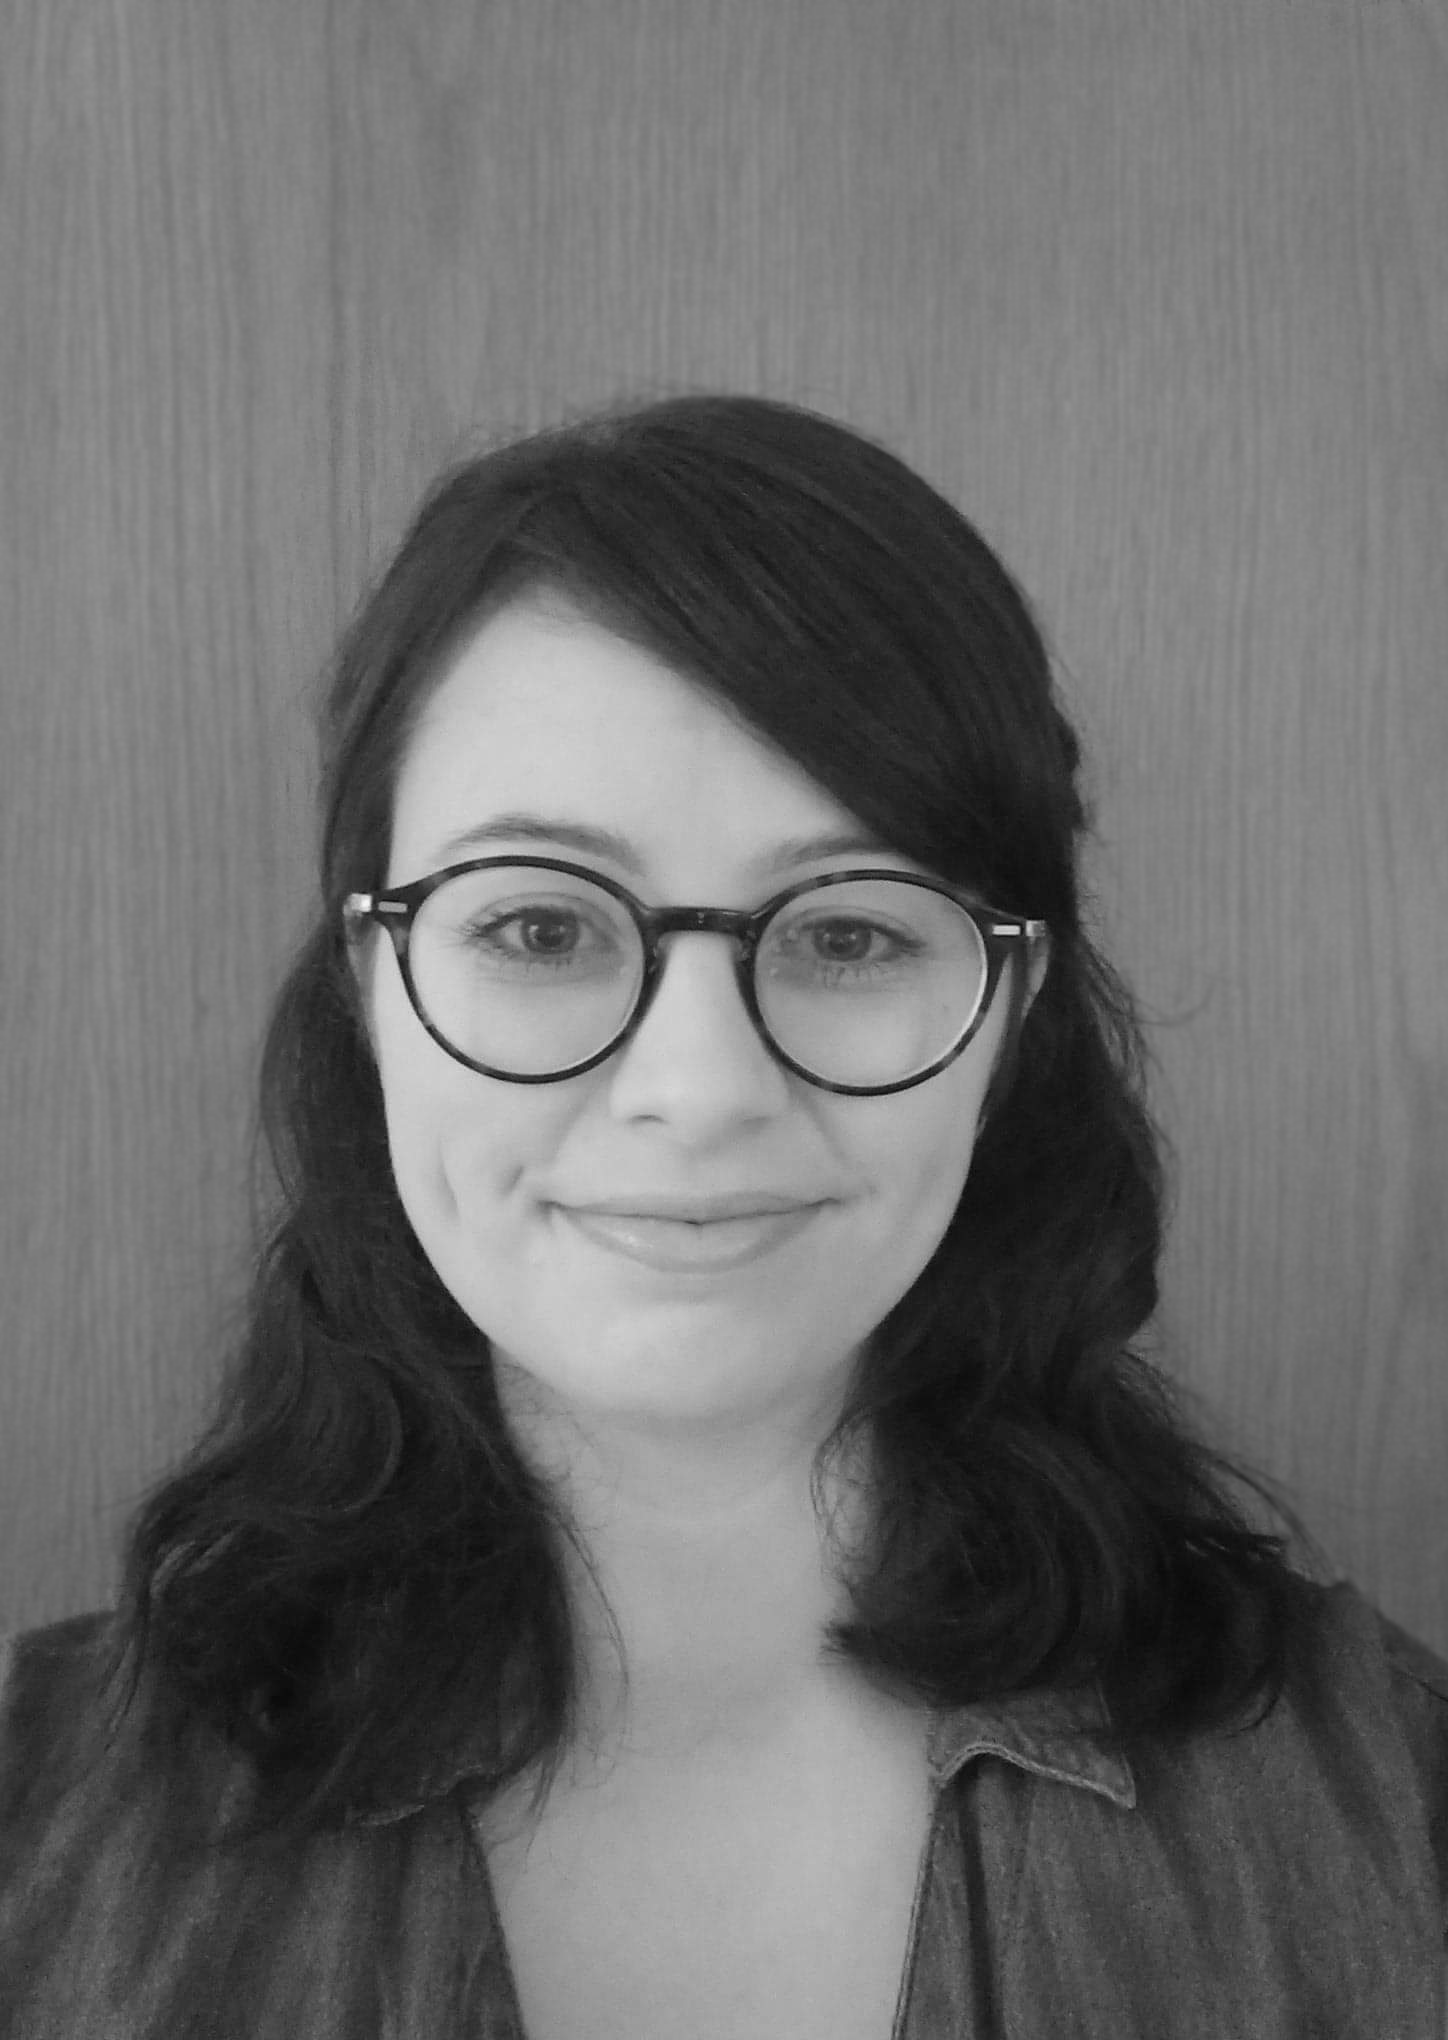 Zoe Peterkin, Summize's Head of Marketing